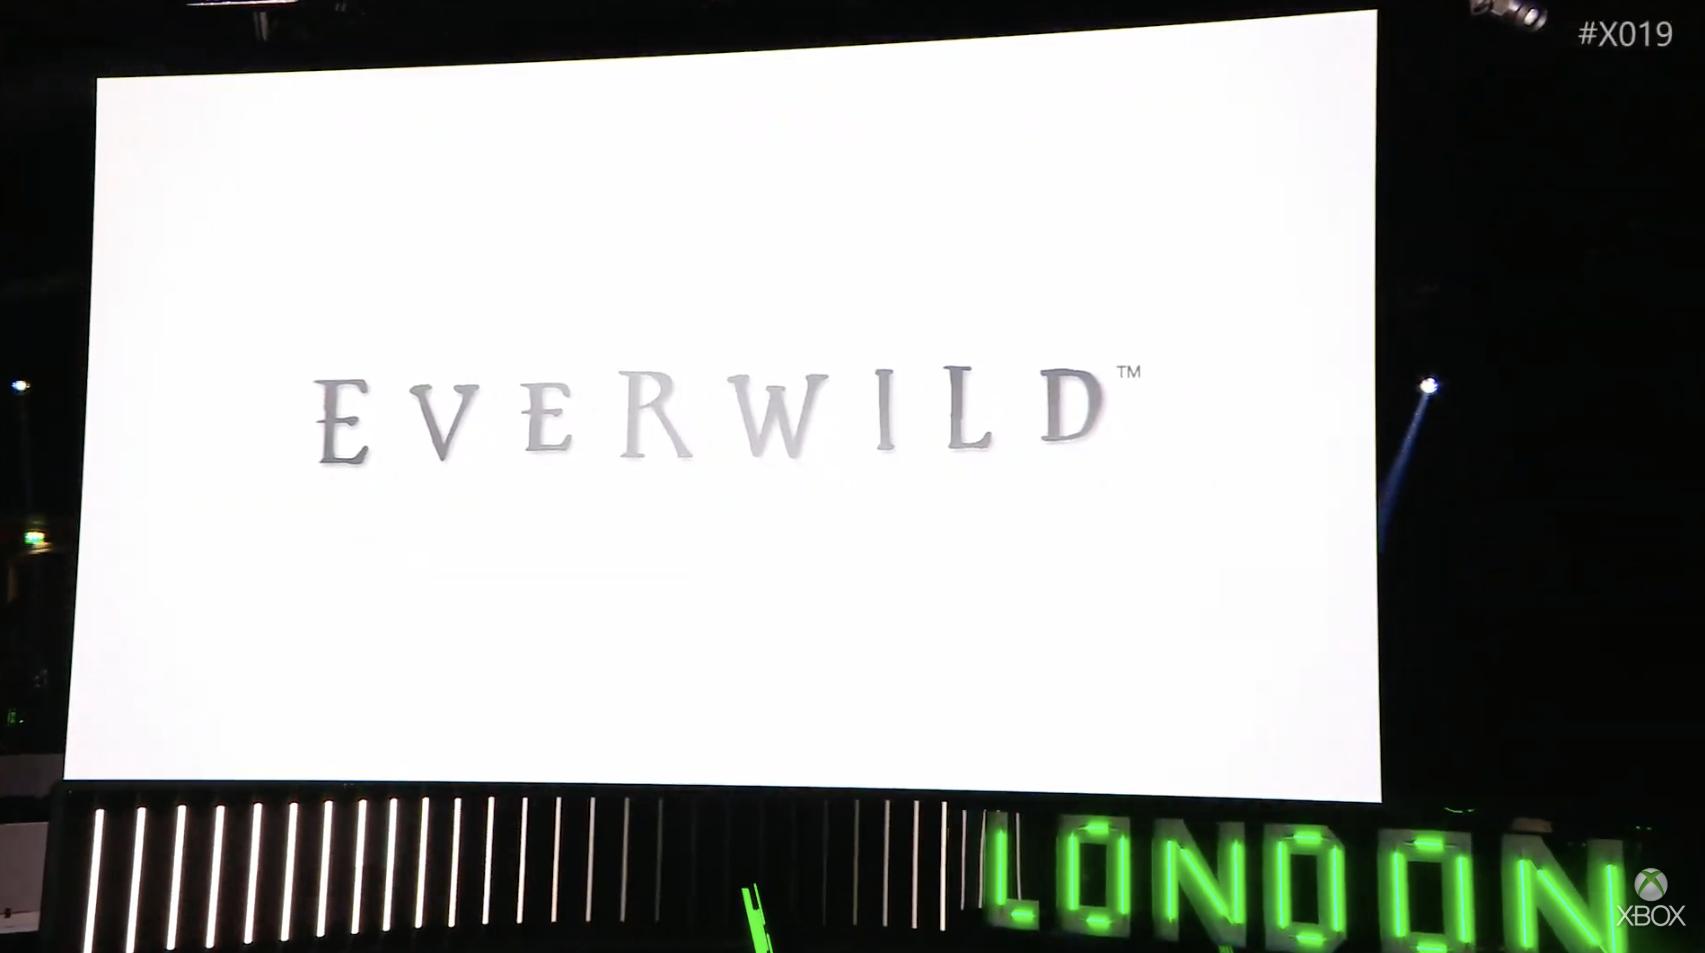 X019 - Everwild